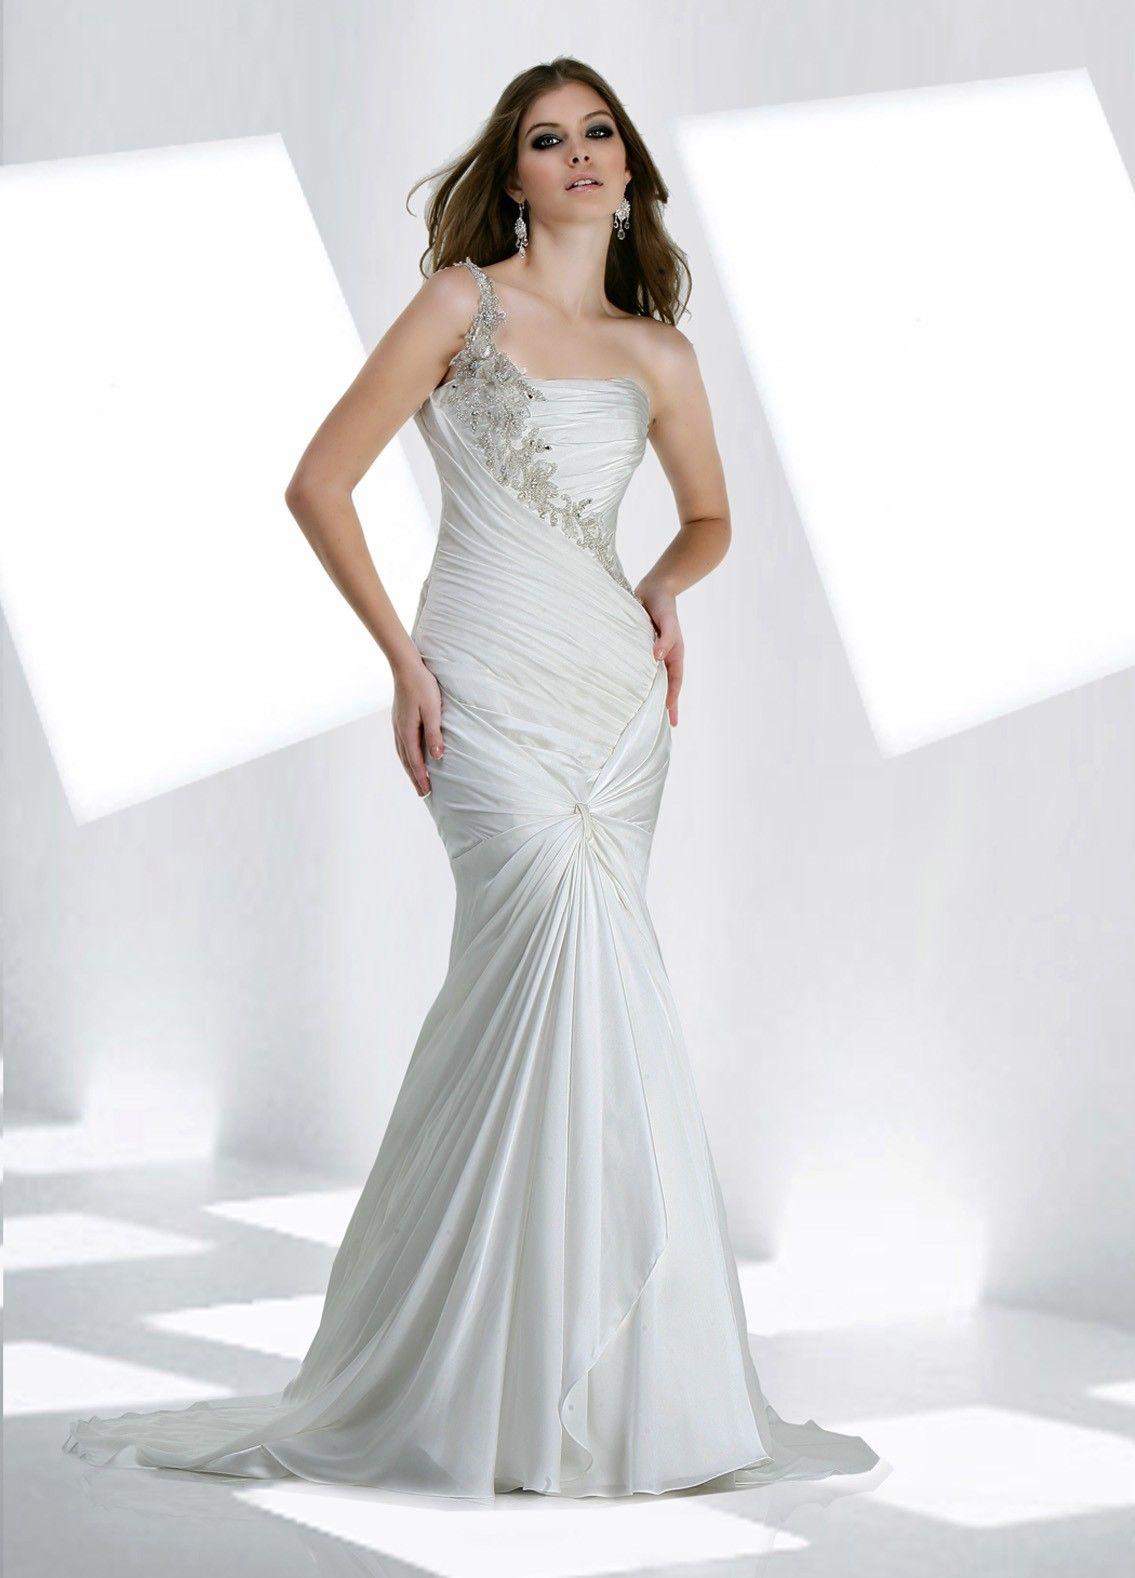 Trumpet style wedding dresses  Chiffon Oneshoulder Ruffled Bodice Mermaid Wedding Dress  Mermaid